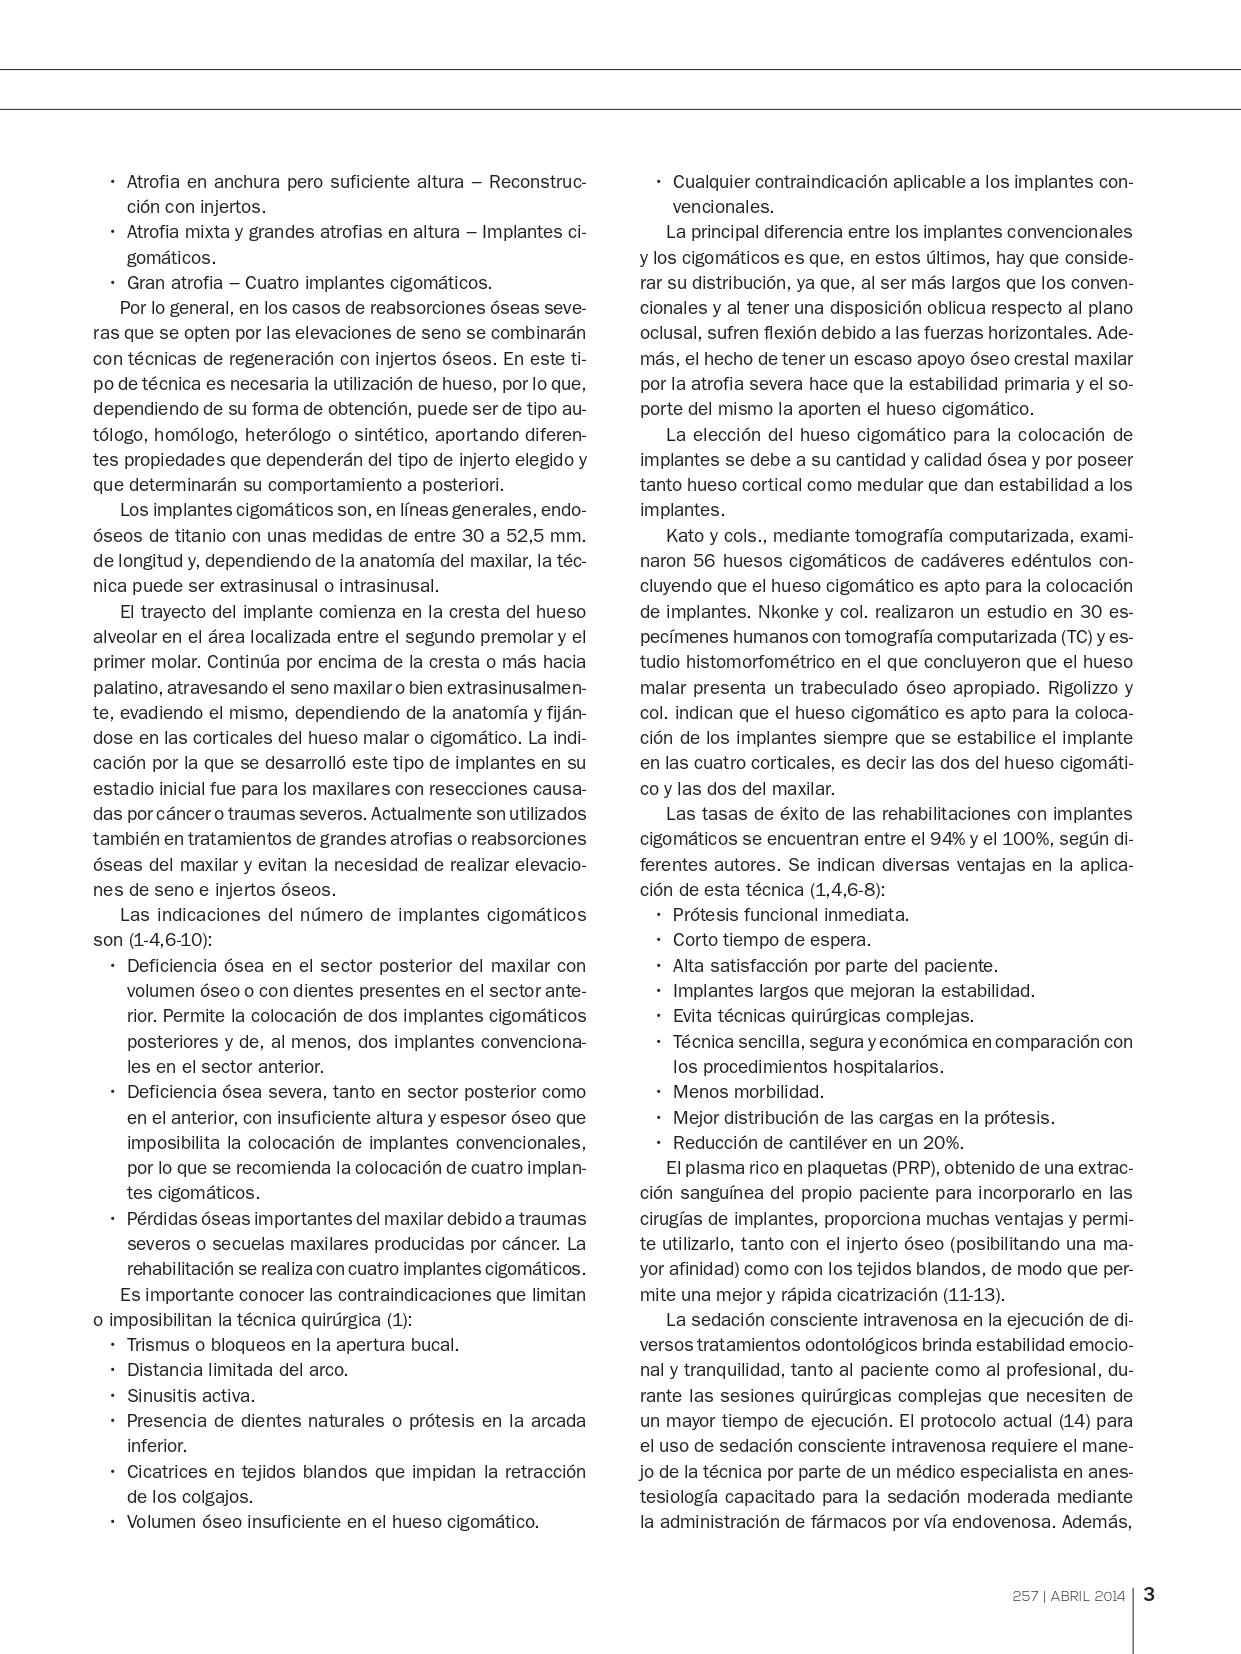 Rehabilitación-maxilar-completa-con-reabsorción-ósea-mediante-4-implantes-cigomáticos_page-0002